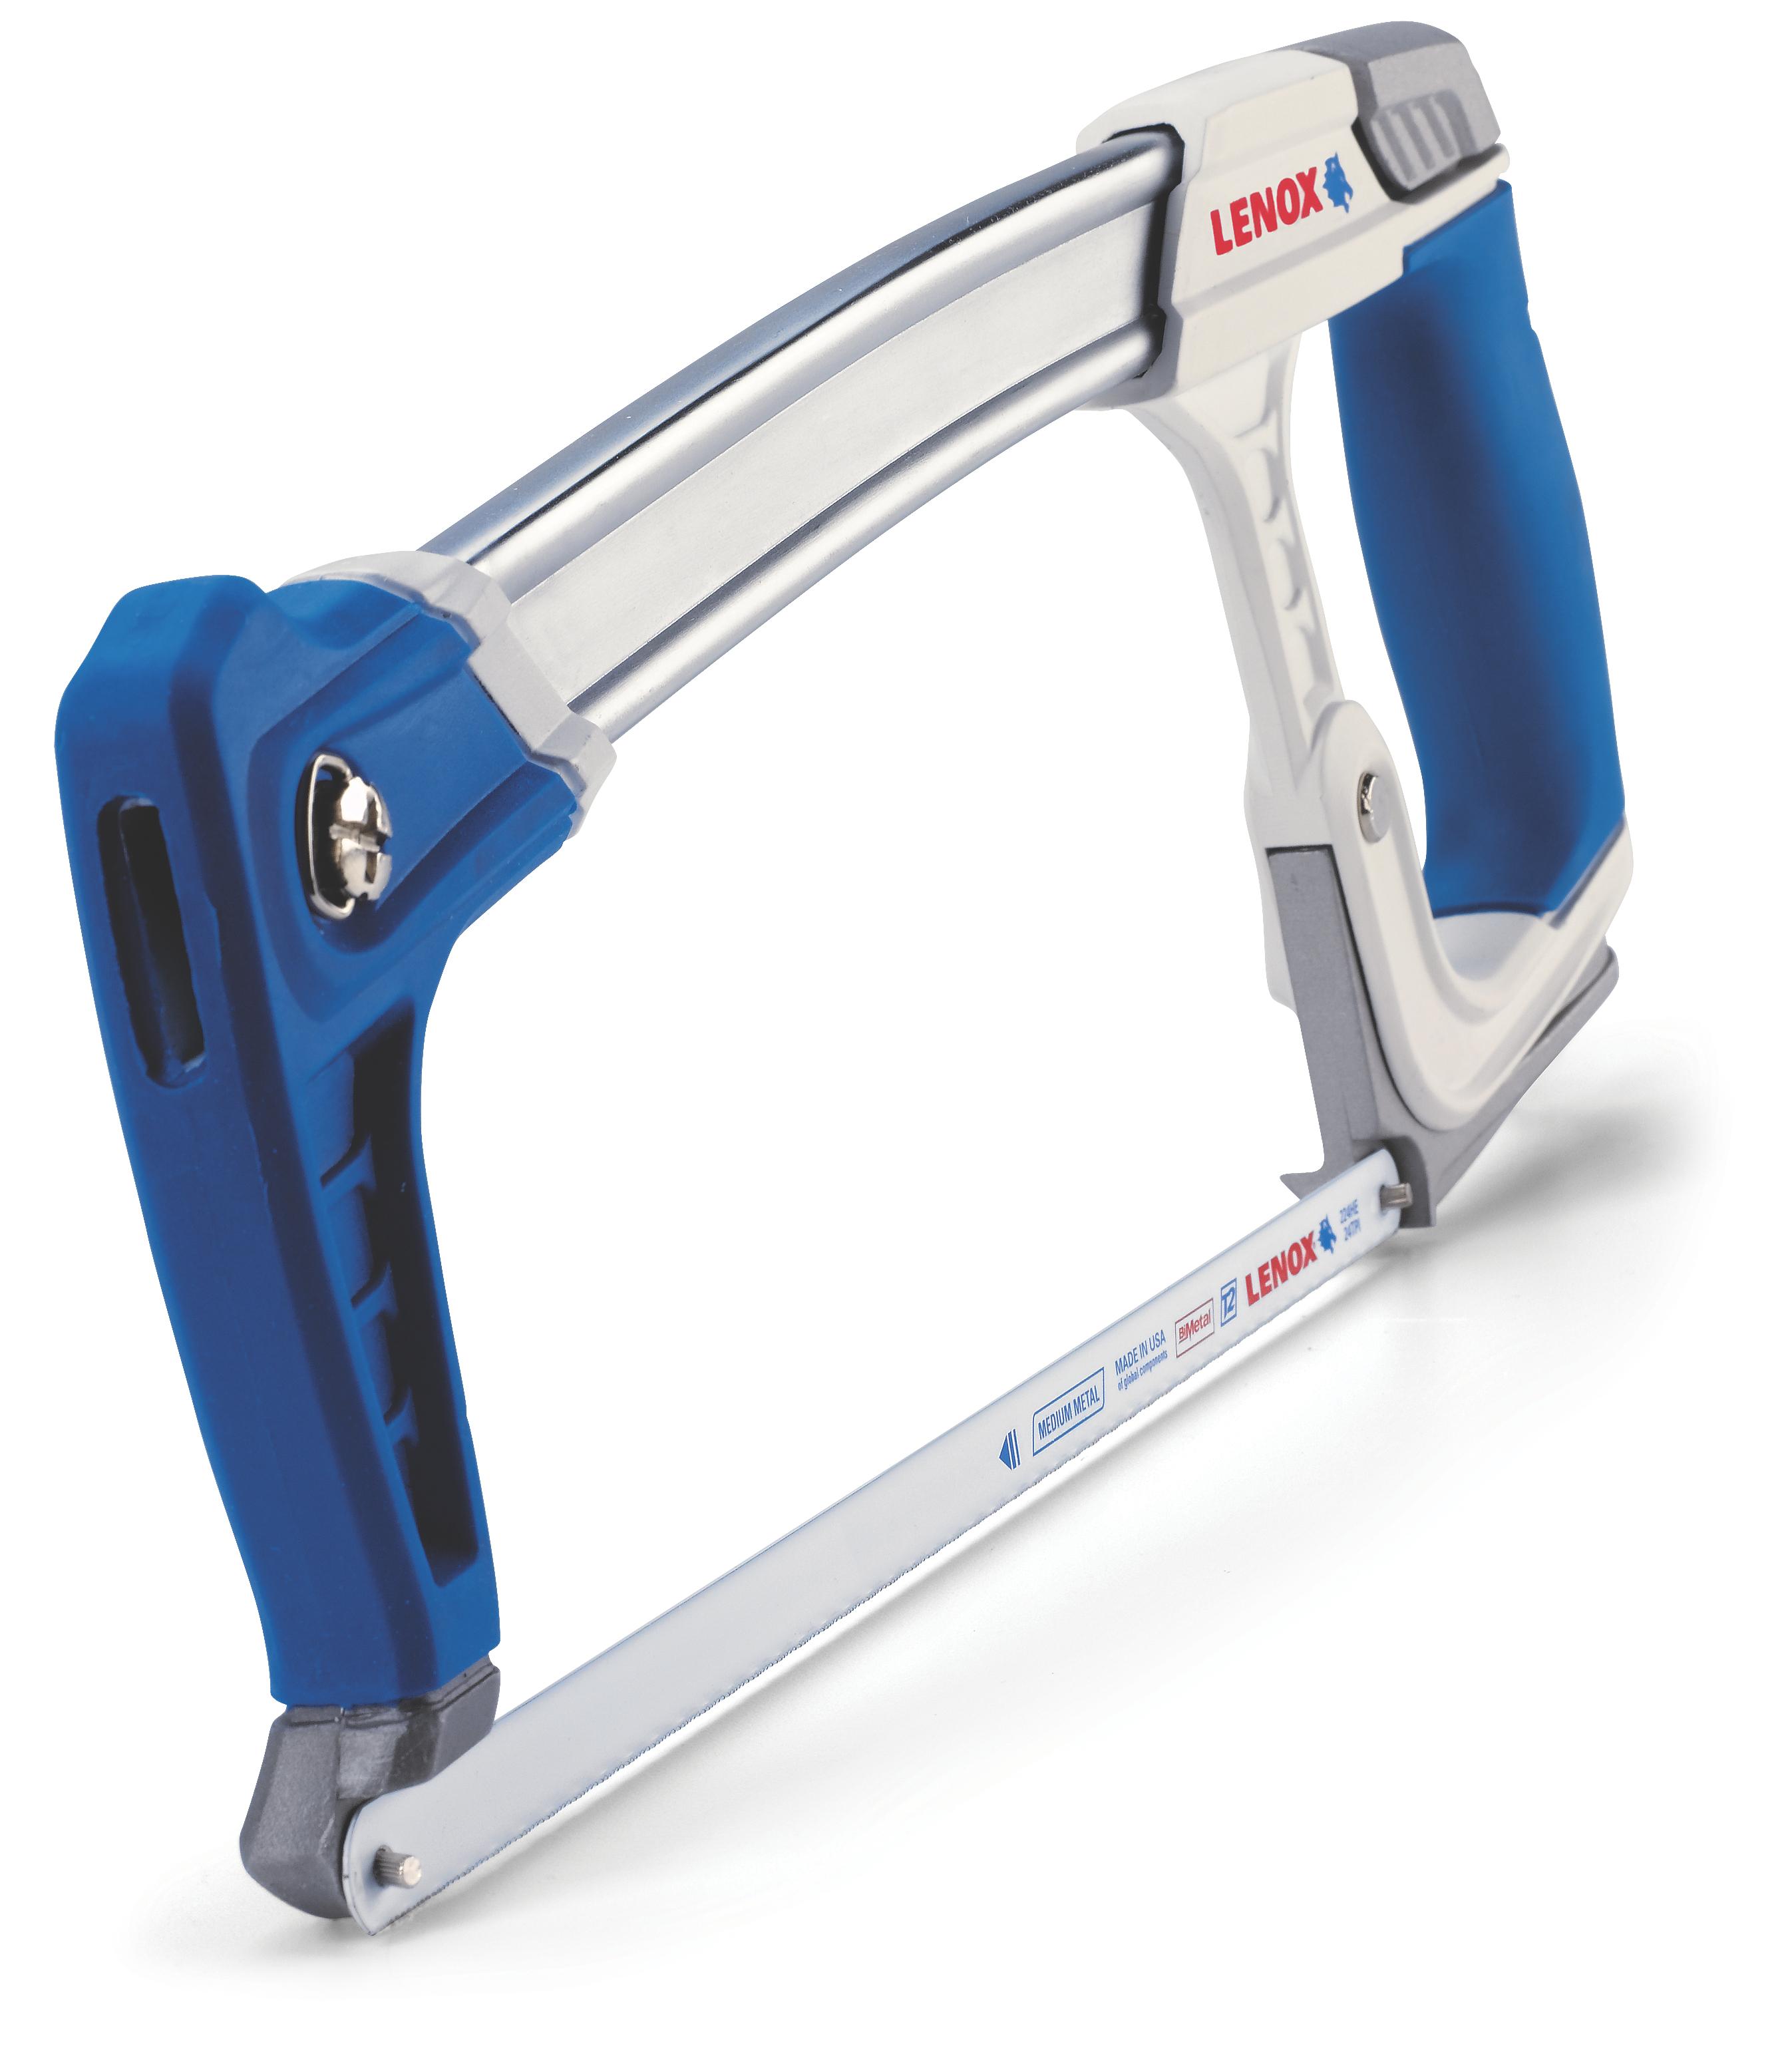 Lenox® 10771FLK1 Lockable Utility Knife, 1-1/8 in W Trapezoid Blade, Bi-Metal Blade, 1 Blade Included